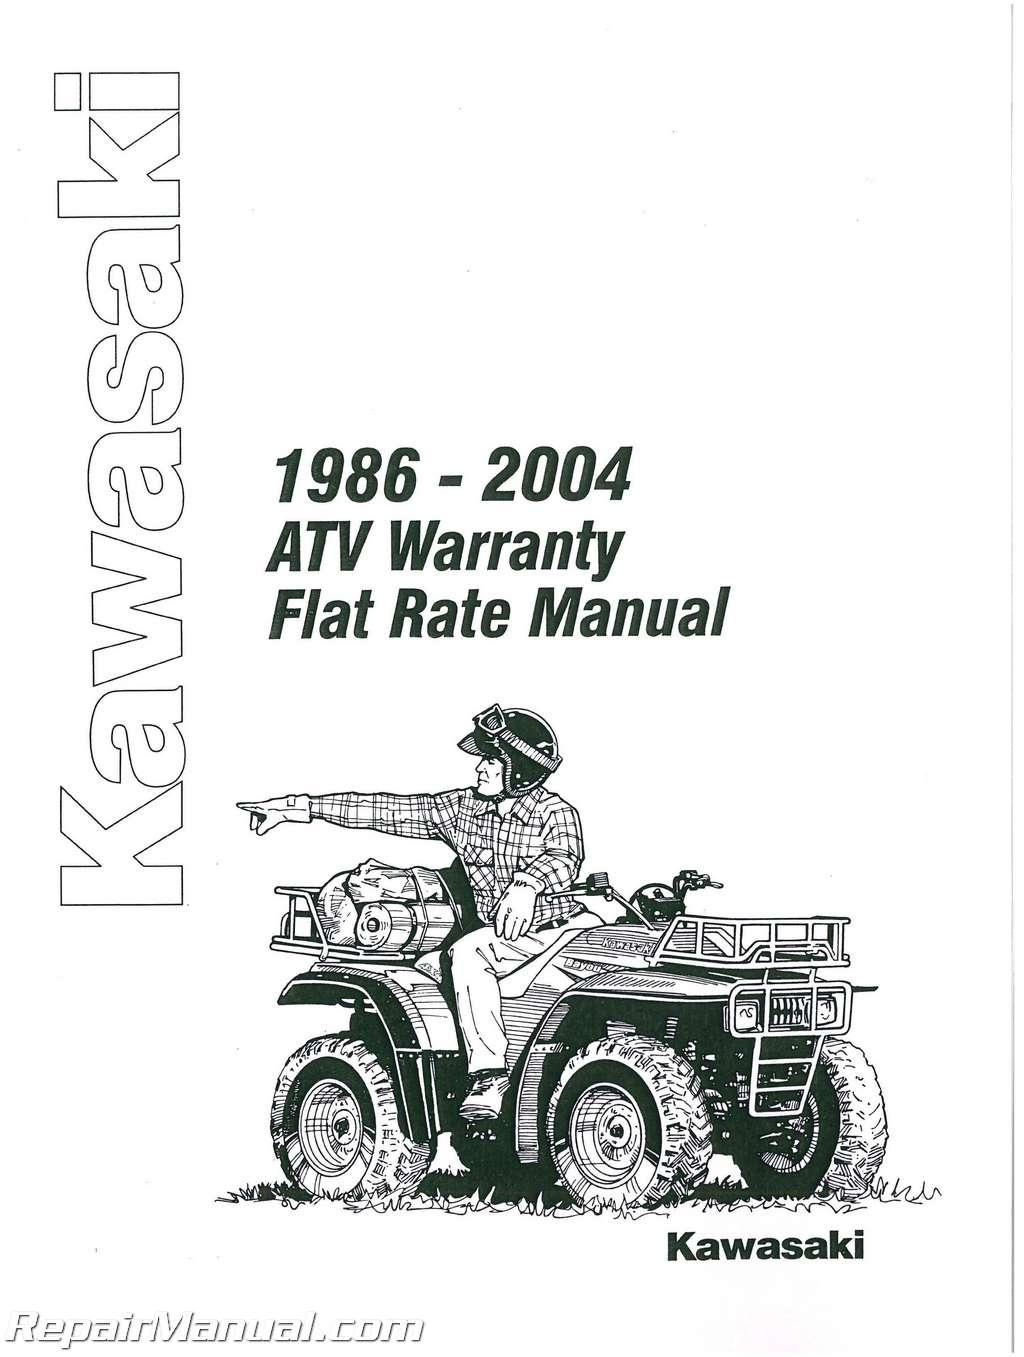 Kawasaki Atv Warranty Flat Rate Manual